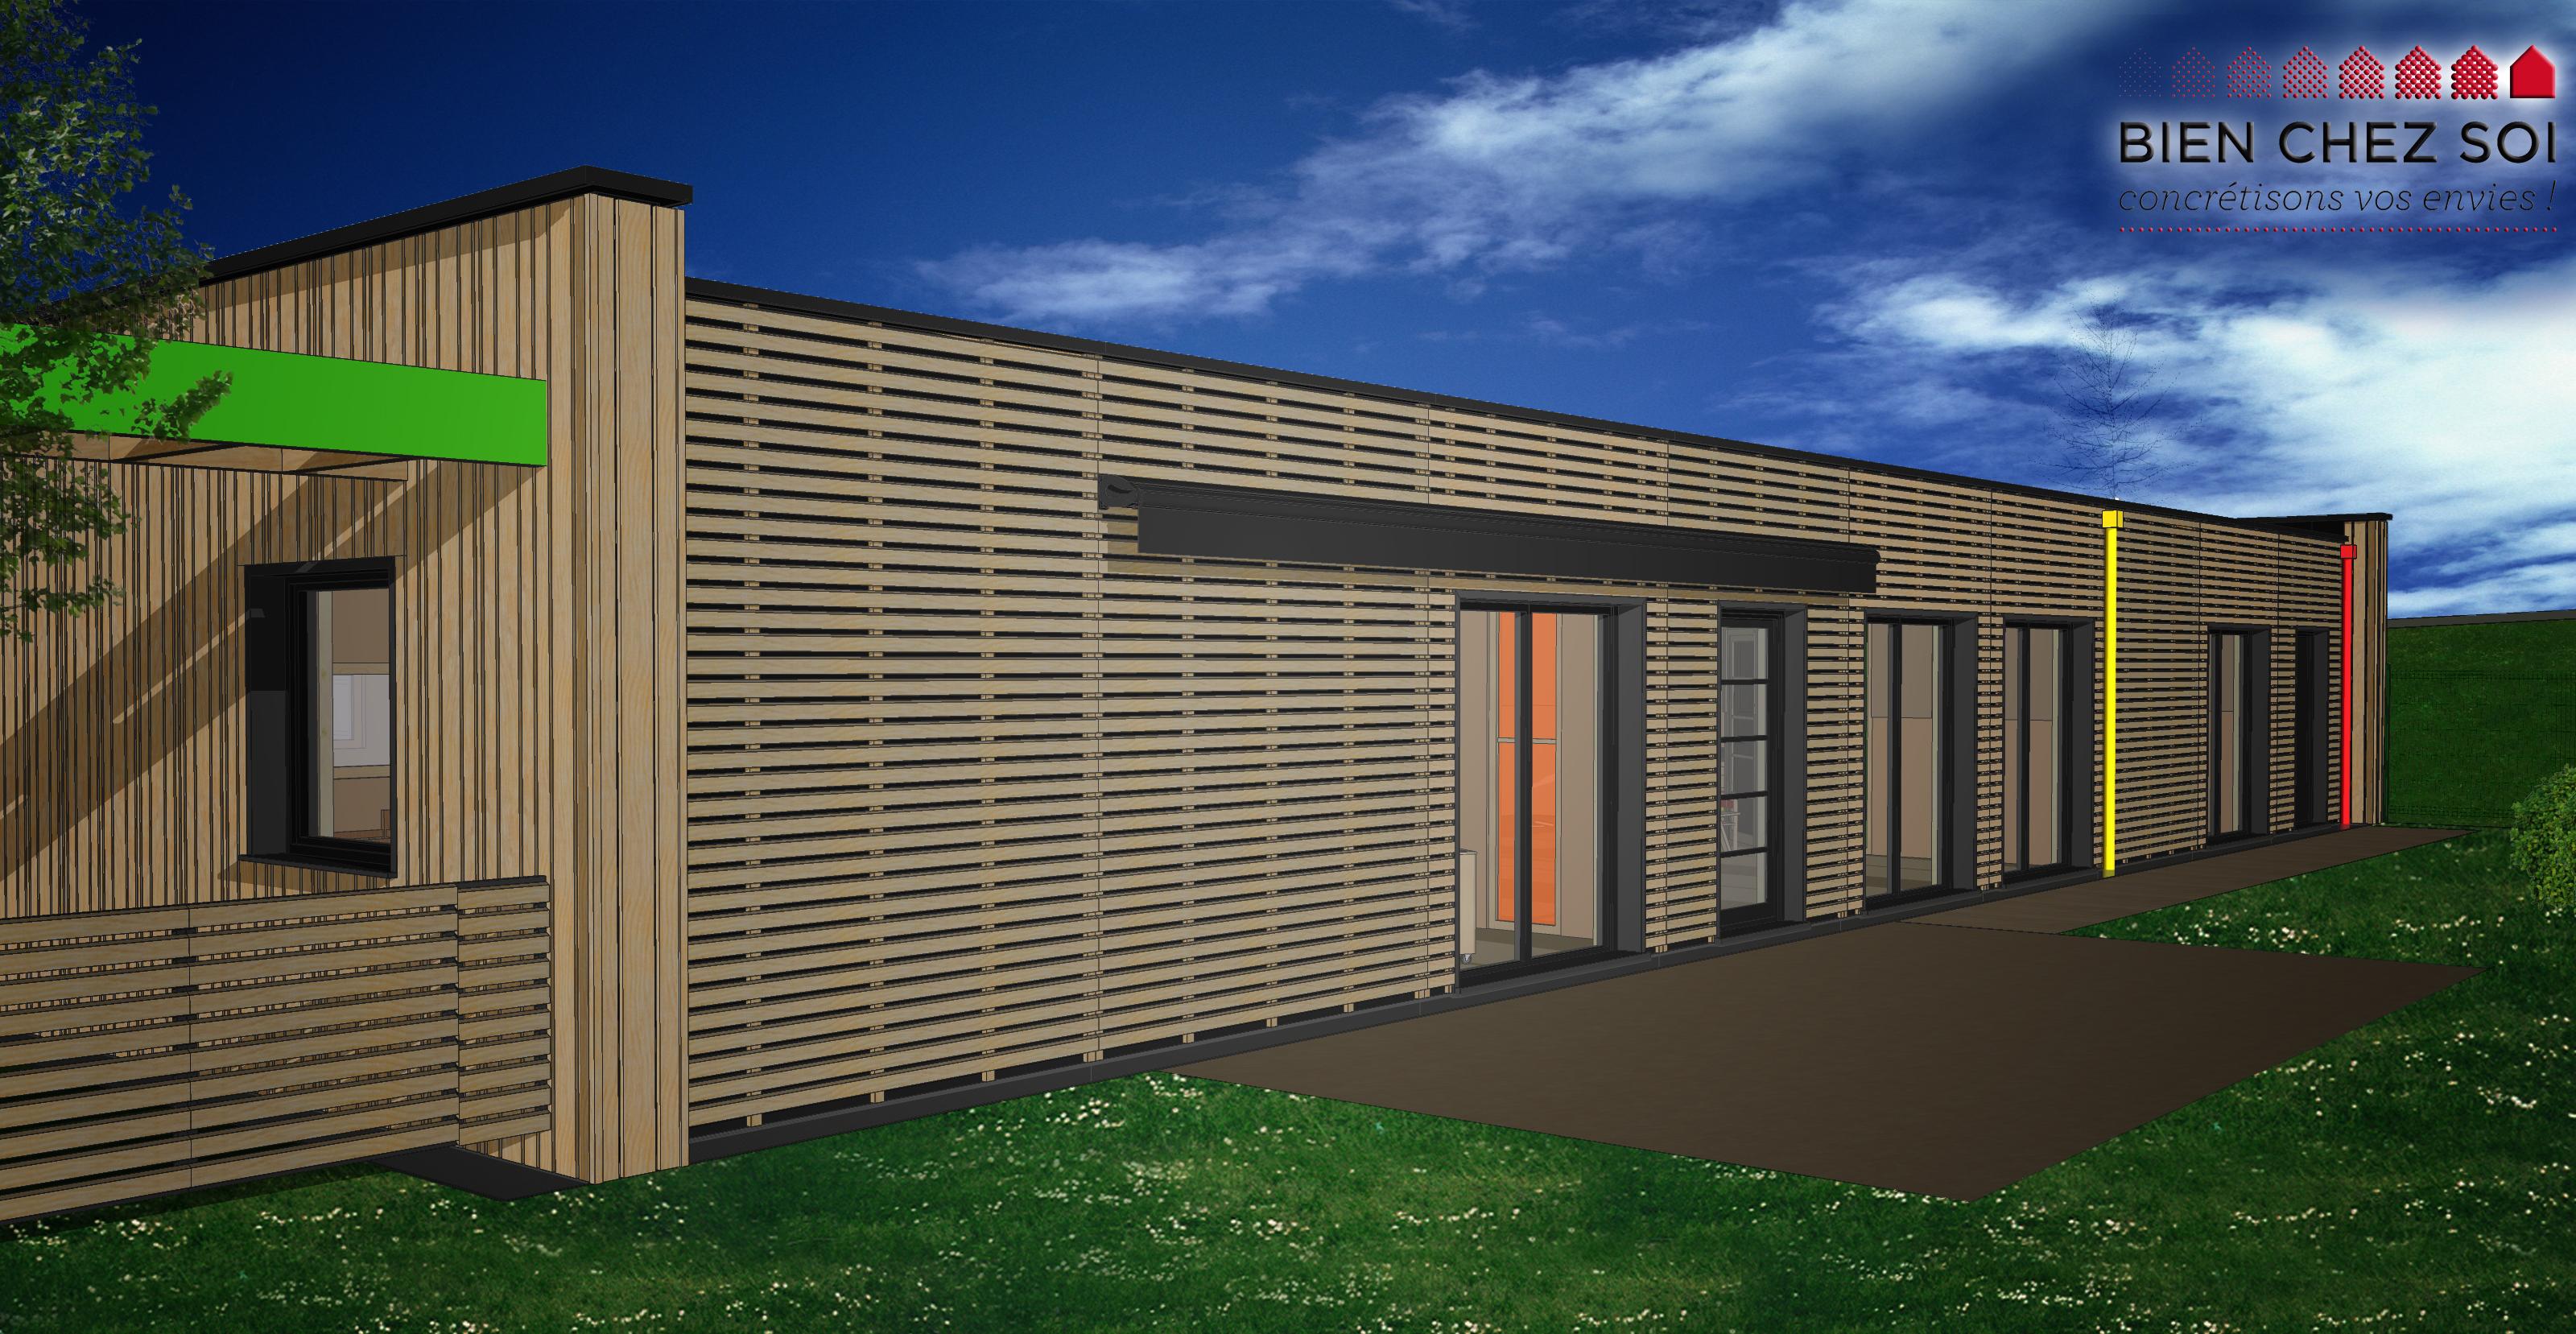 Lille-architecte-Montage-CRECHE-A